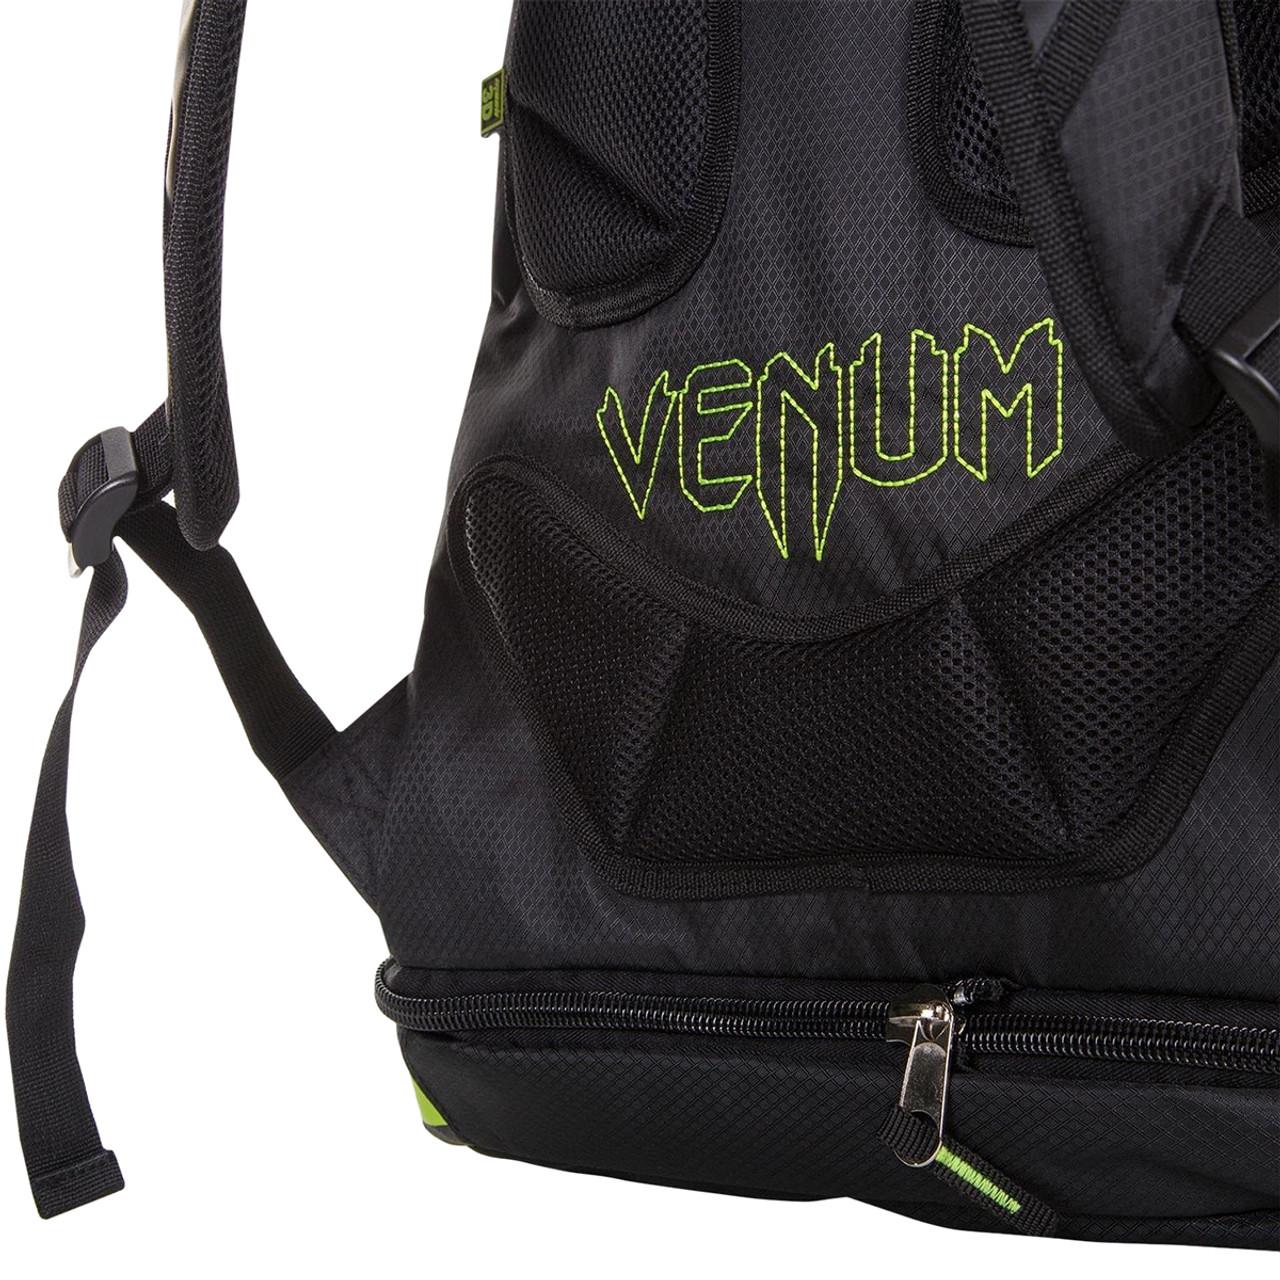 6296afc8f4d2 ... Venum Challenger Xtreme Backpack - Black Neo Yellow ·  https   d3d71ba2asa5oz.cloudfront.net 52000730 images vn23395%